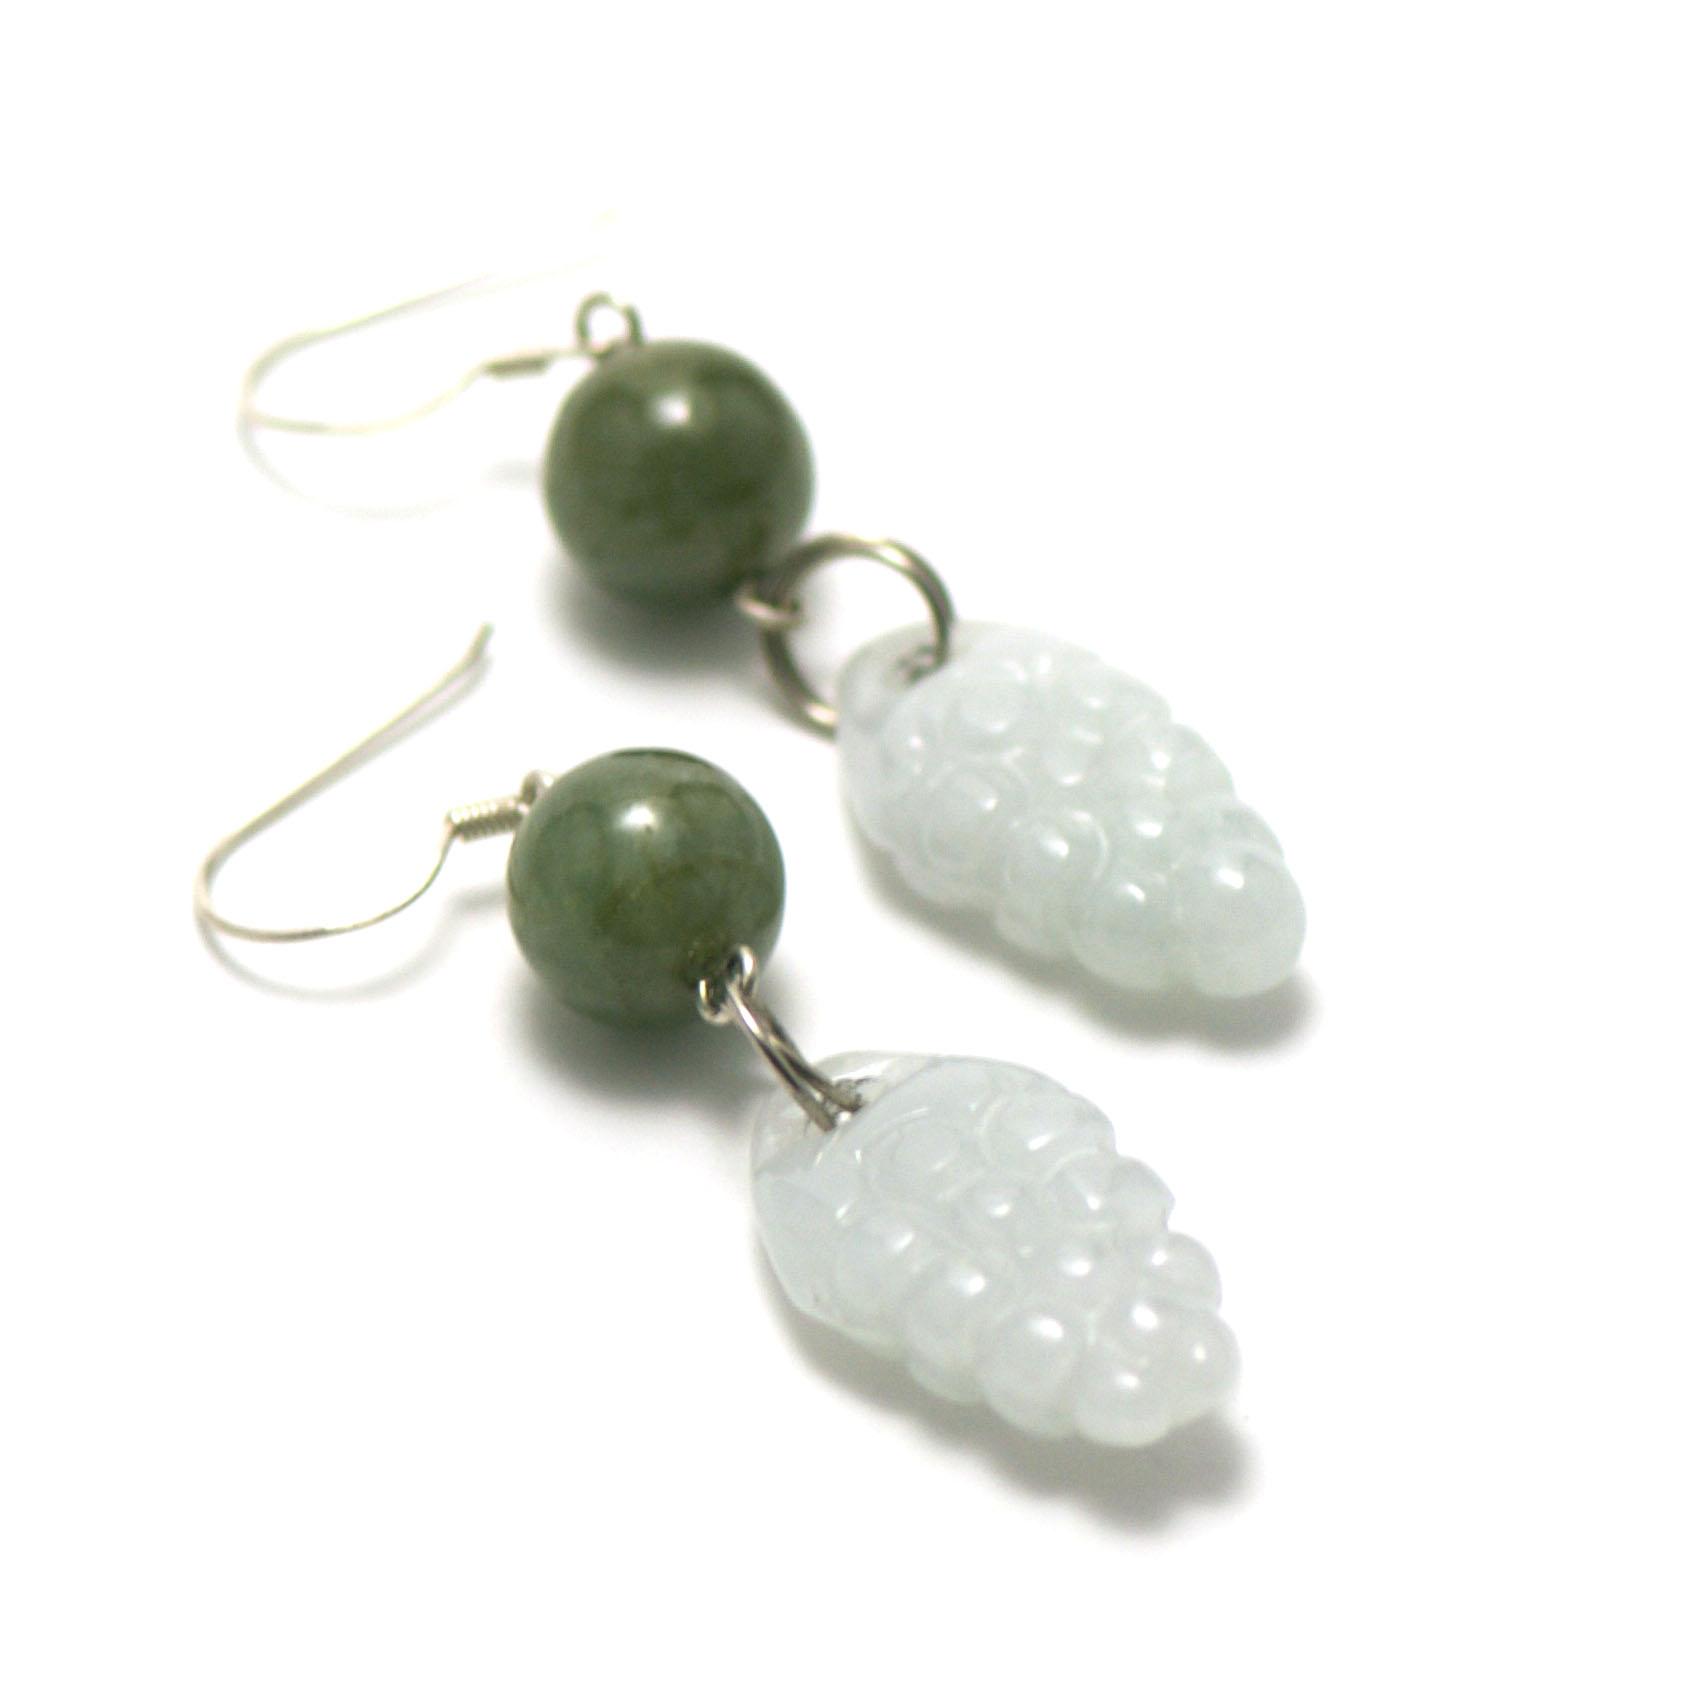 boucle d\'oreille jade , perle grappe de raisin - perle ronde 10 mm